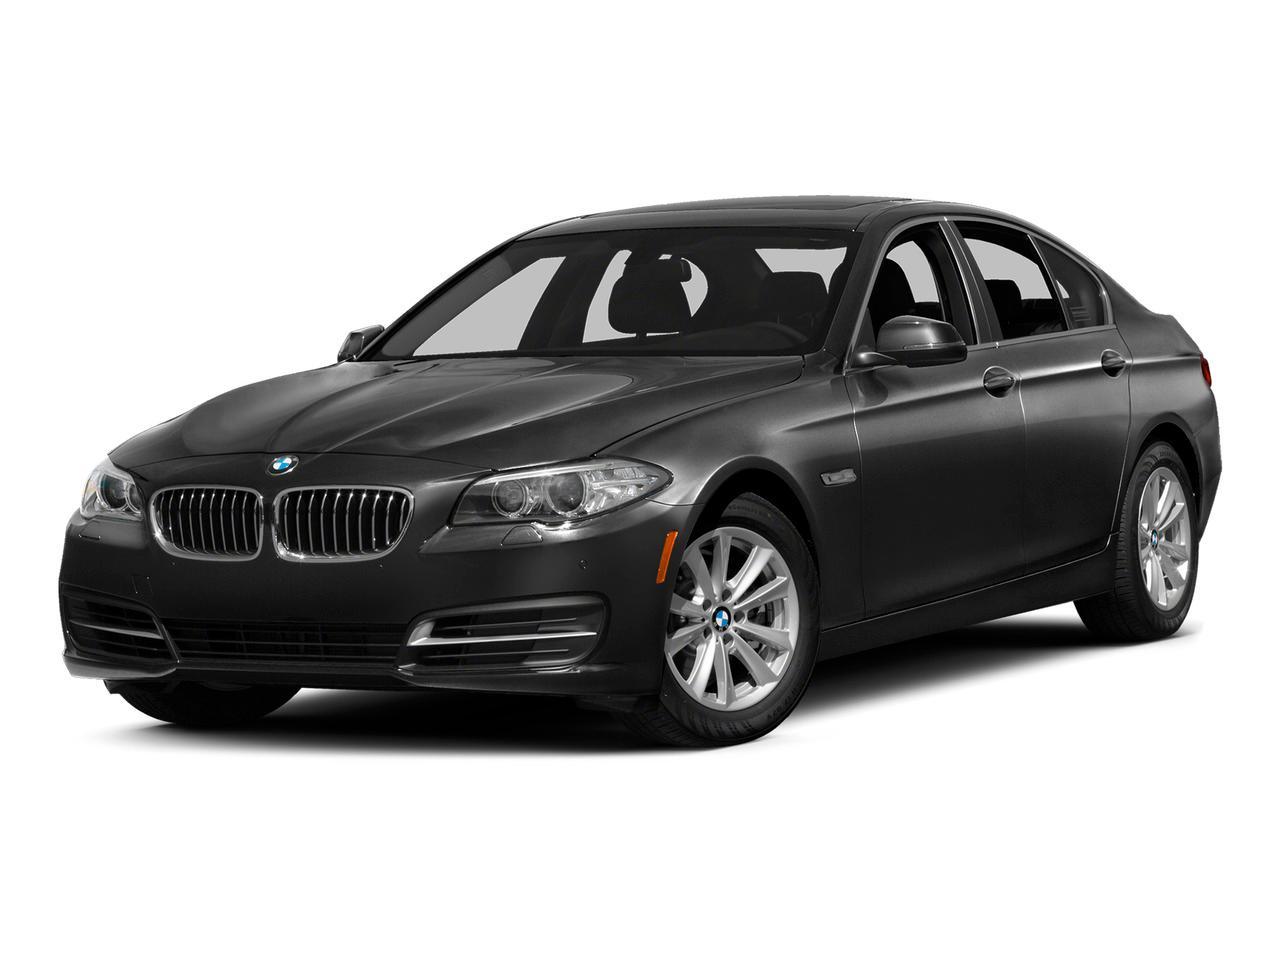 2015 BMW 528i xDrive Vehicle Photo in Oak Lawn, IL 60453-2517